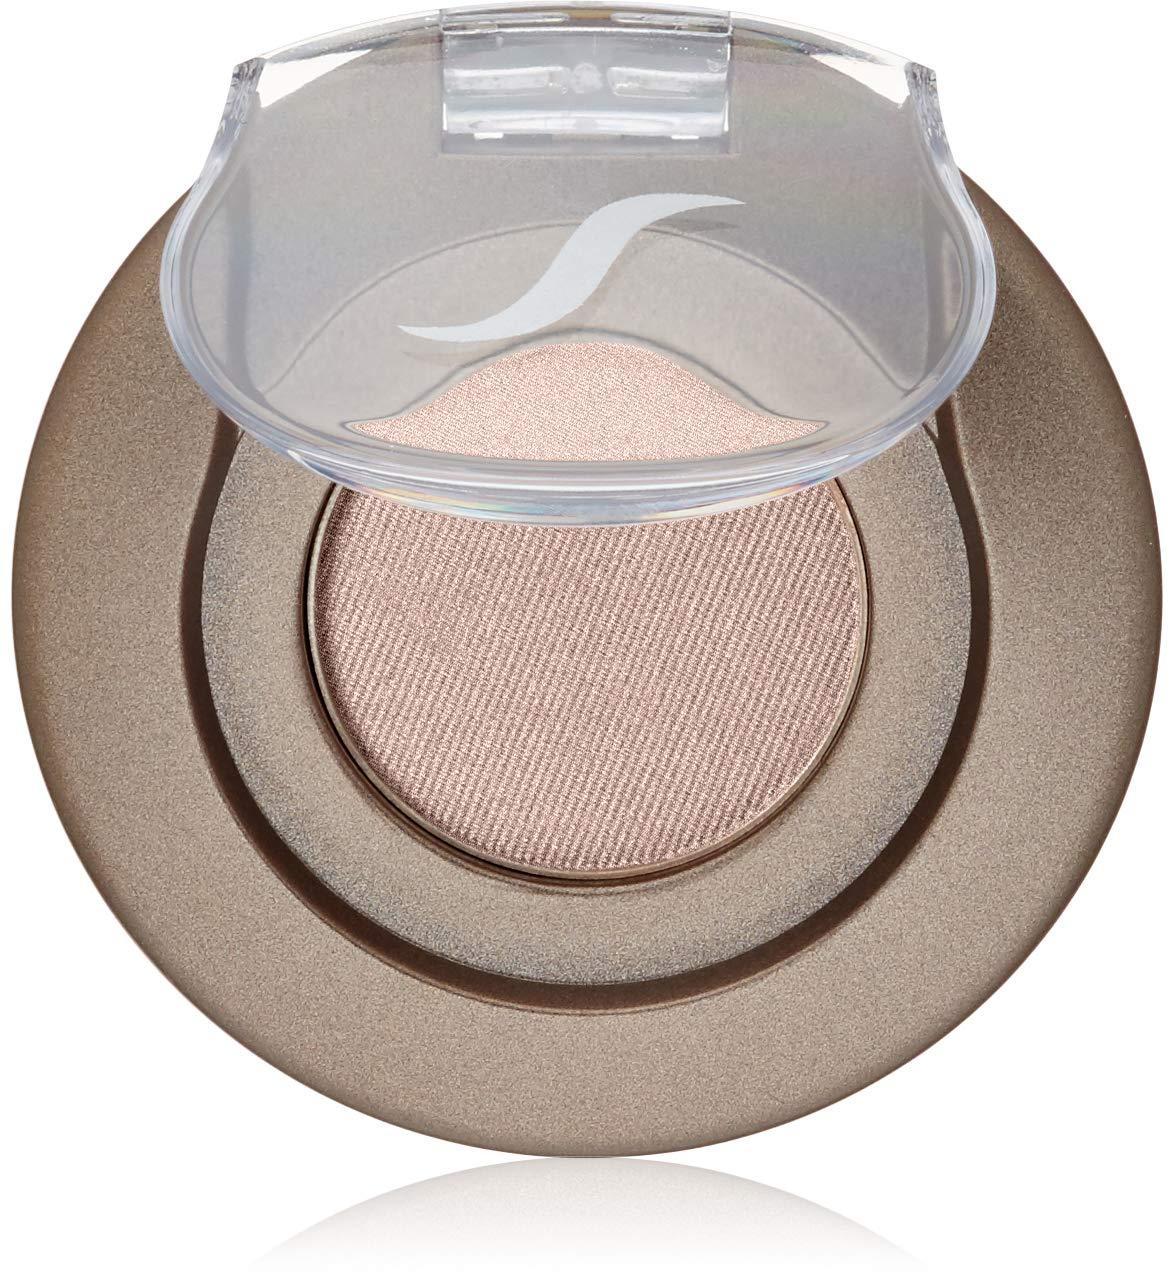 Sorme' Treatement Cosmetics Mineral Botanicals Eye Shadow, Flash